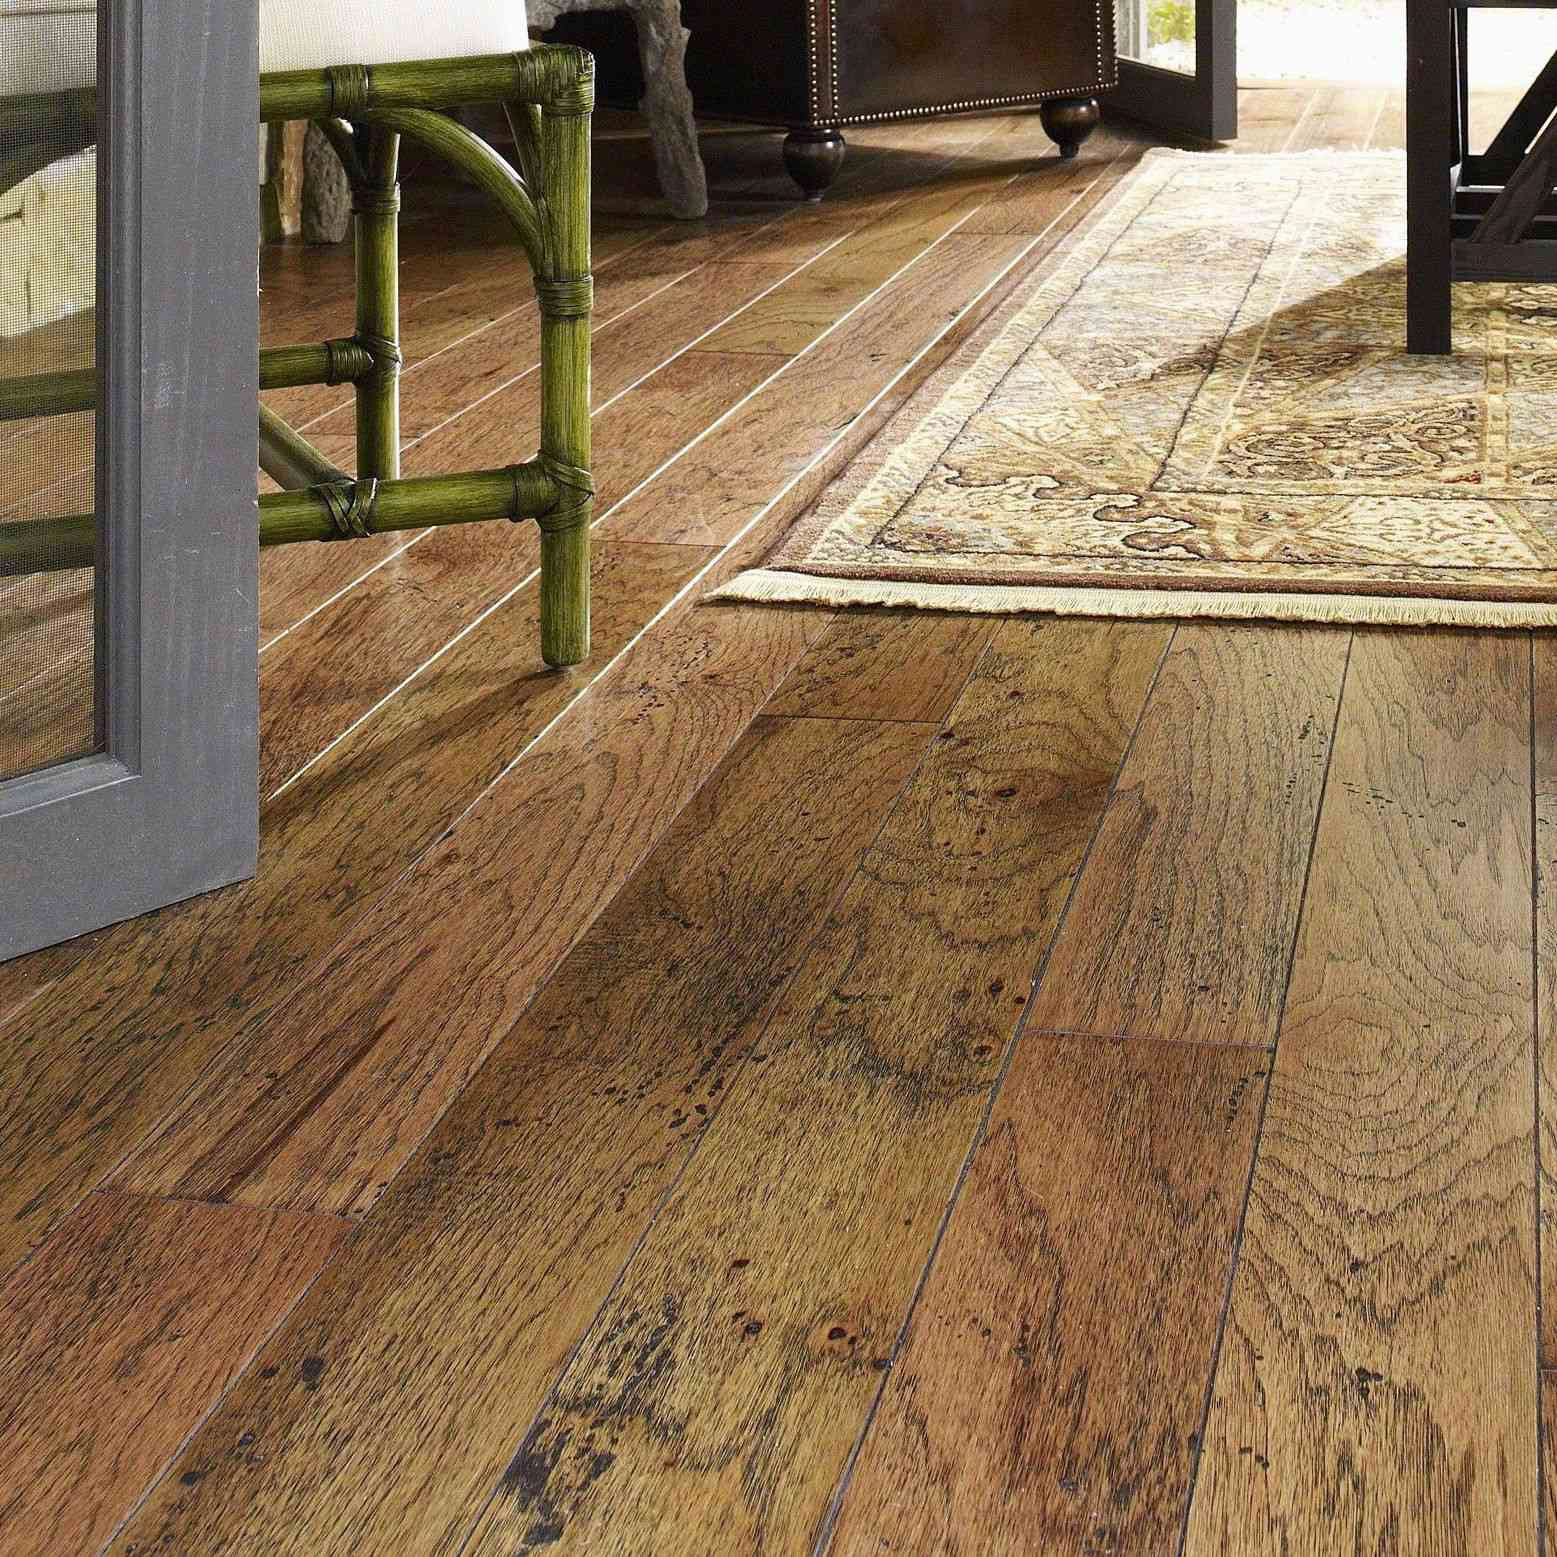 types of hardwood floor finishes of hardwood floor installation floor plan ideas inside hardwood floor designs new best type wood flooring best floor floor wood floor wood 0d